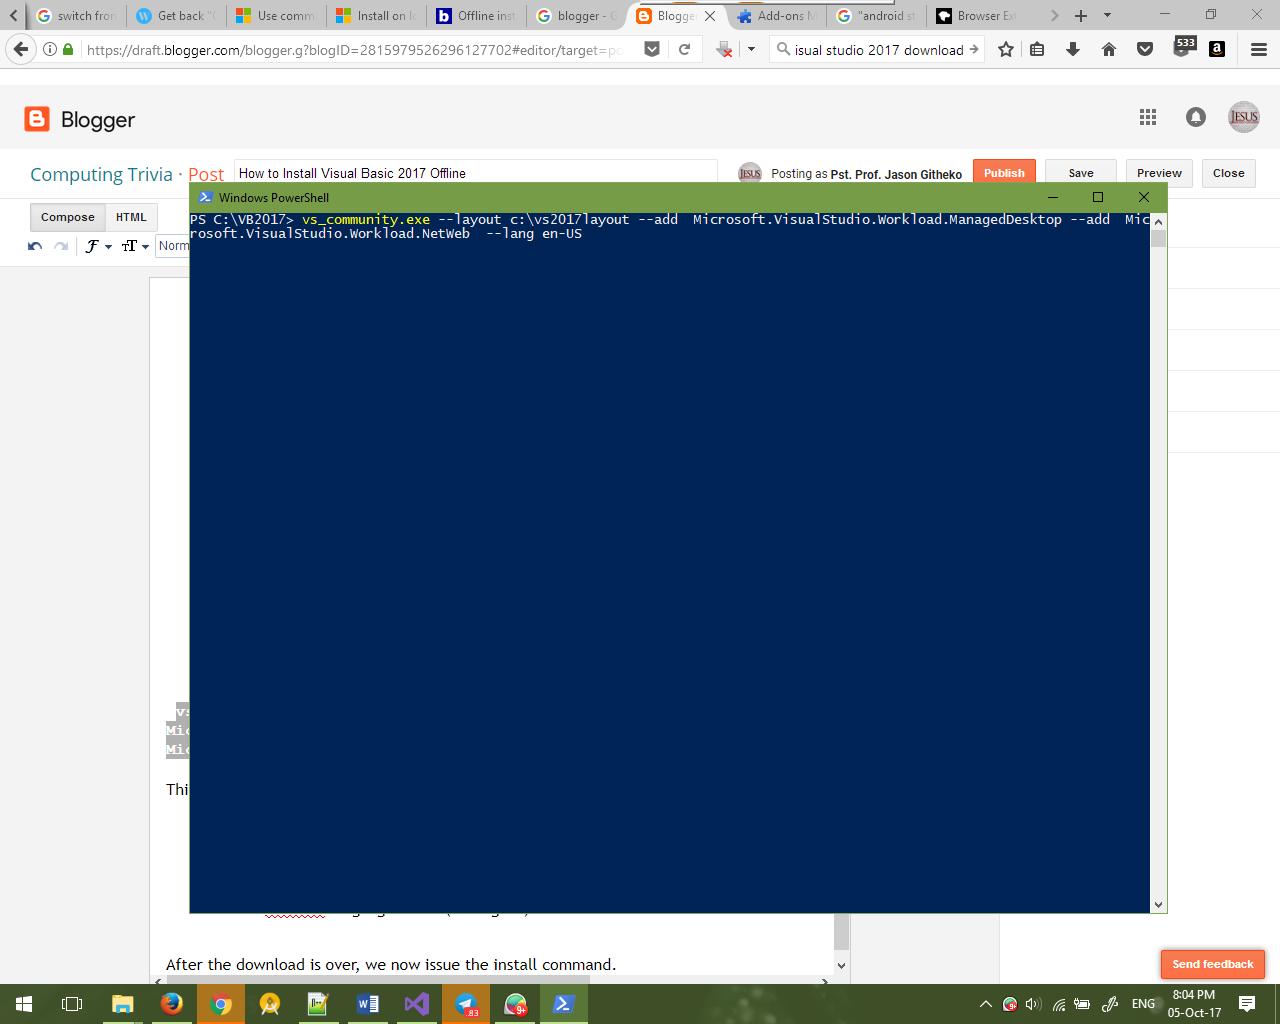 vs_community.exe offline install